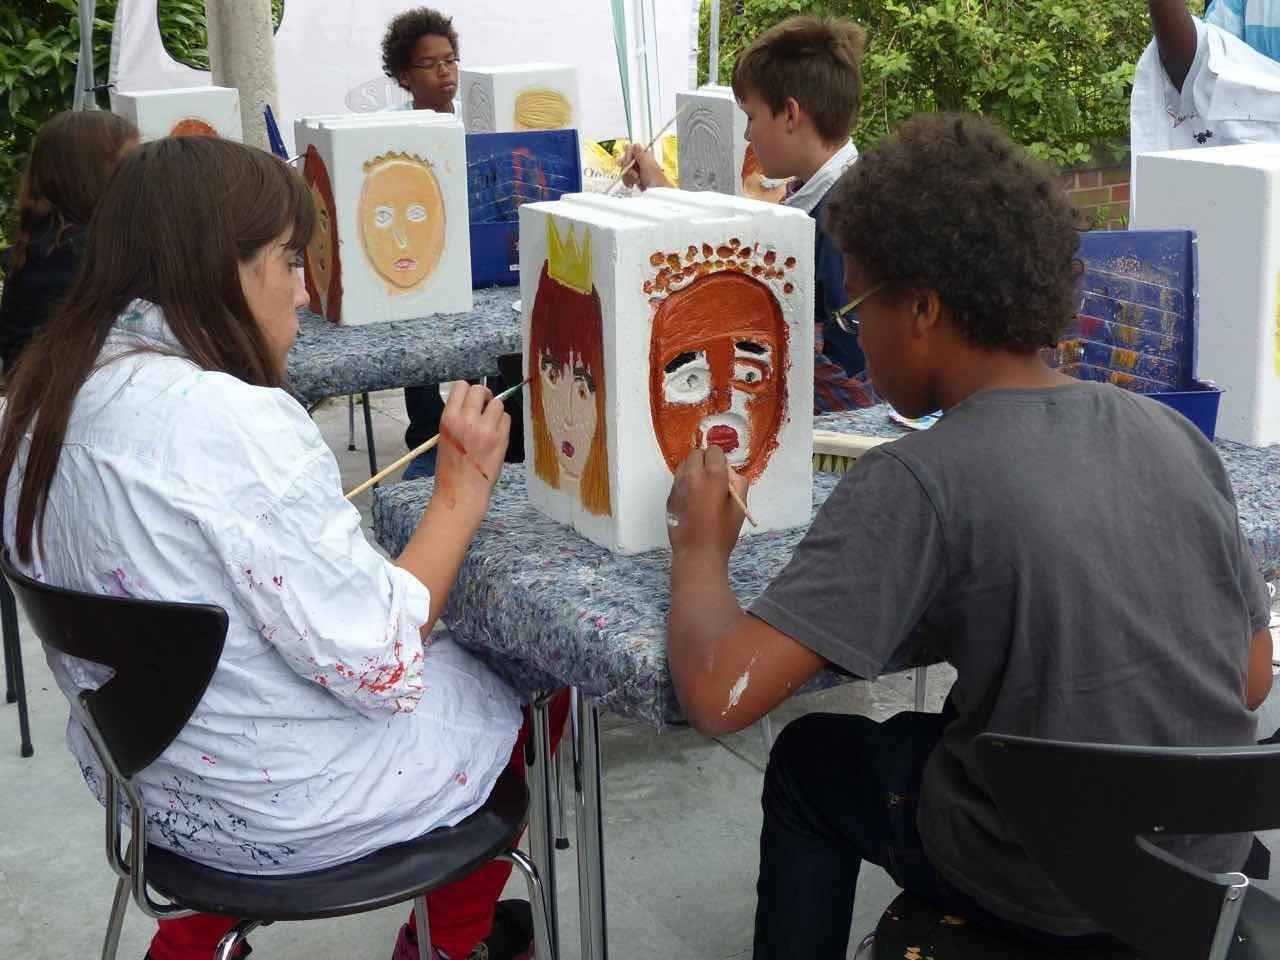 Partizipative Kunst in der Jugendhilfe: Arbeit am Marterpfahl